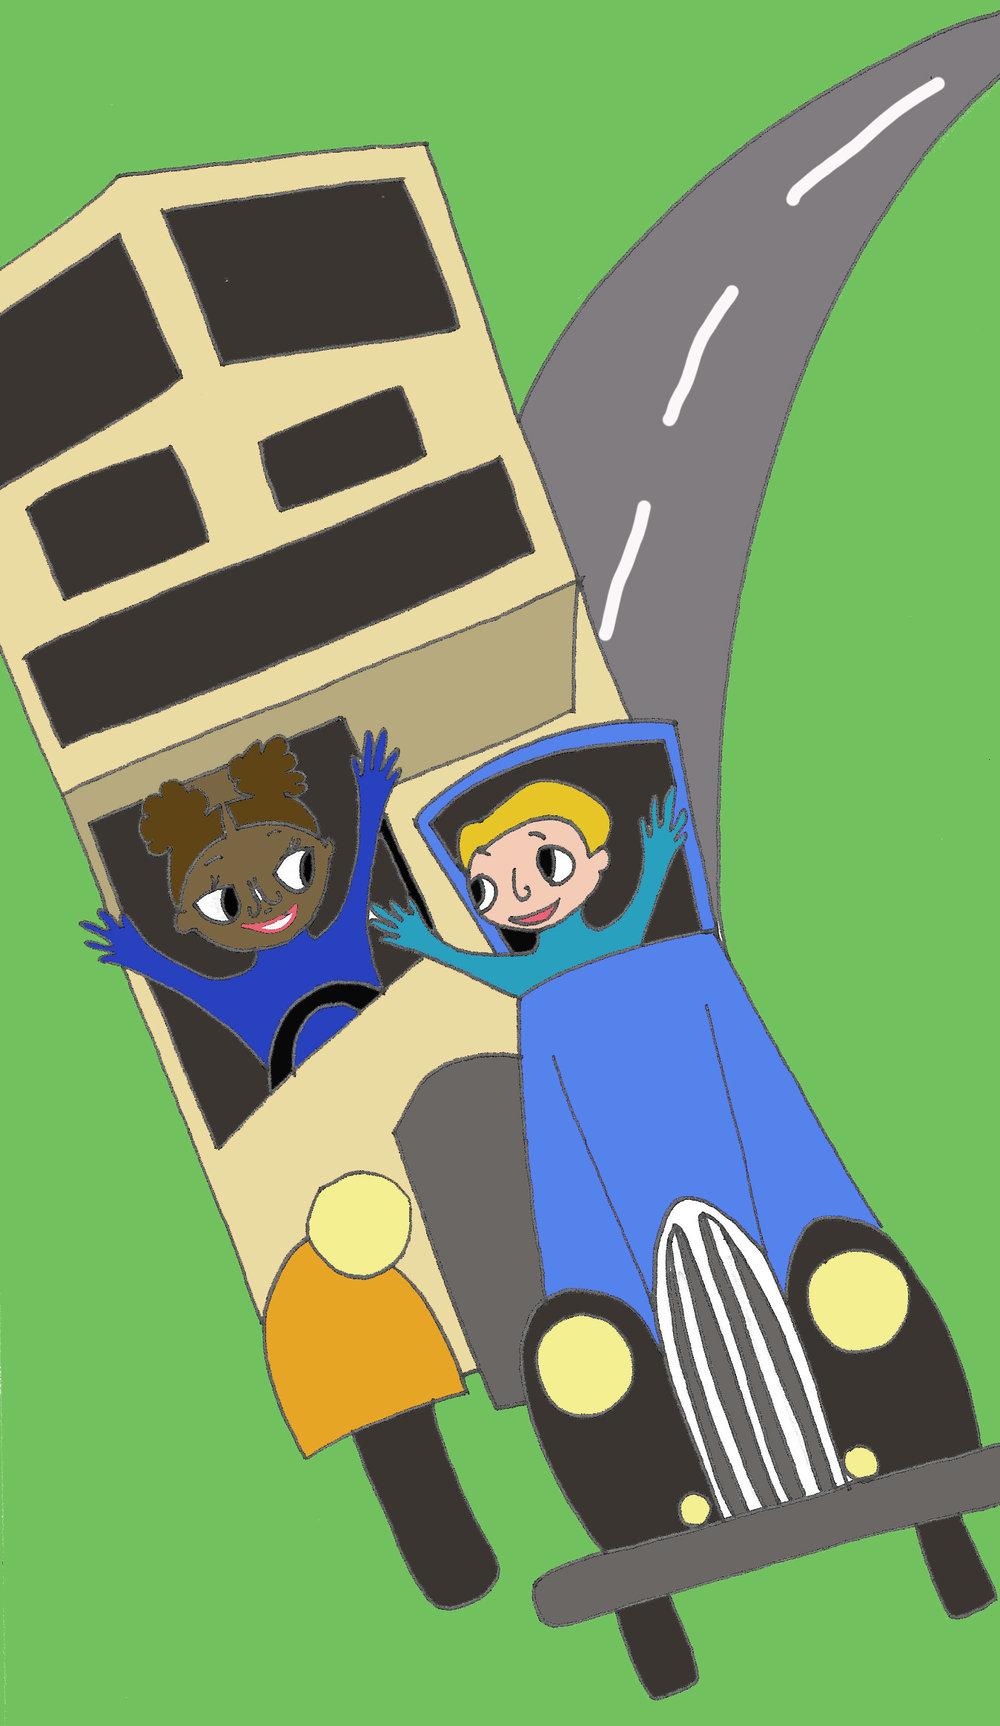 Transport kids visual 2psd.jpg